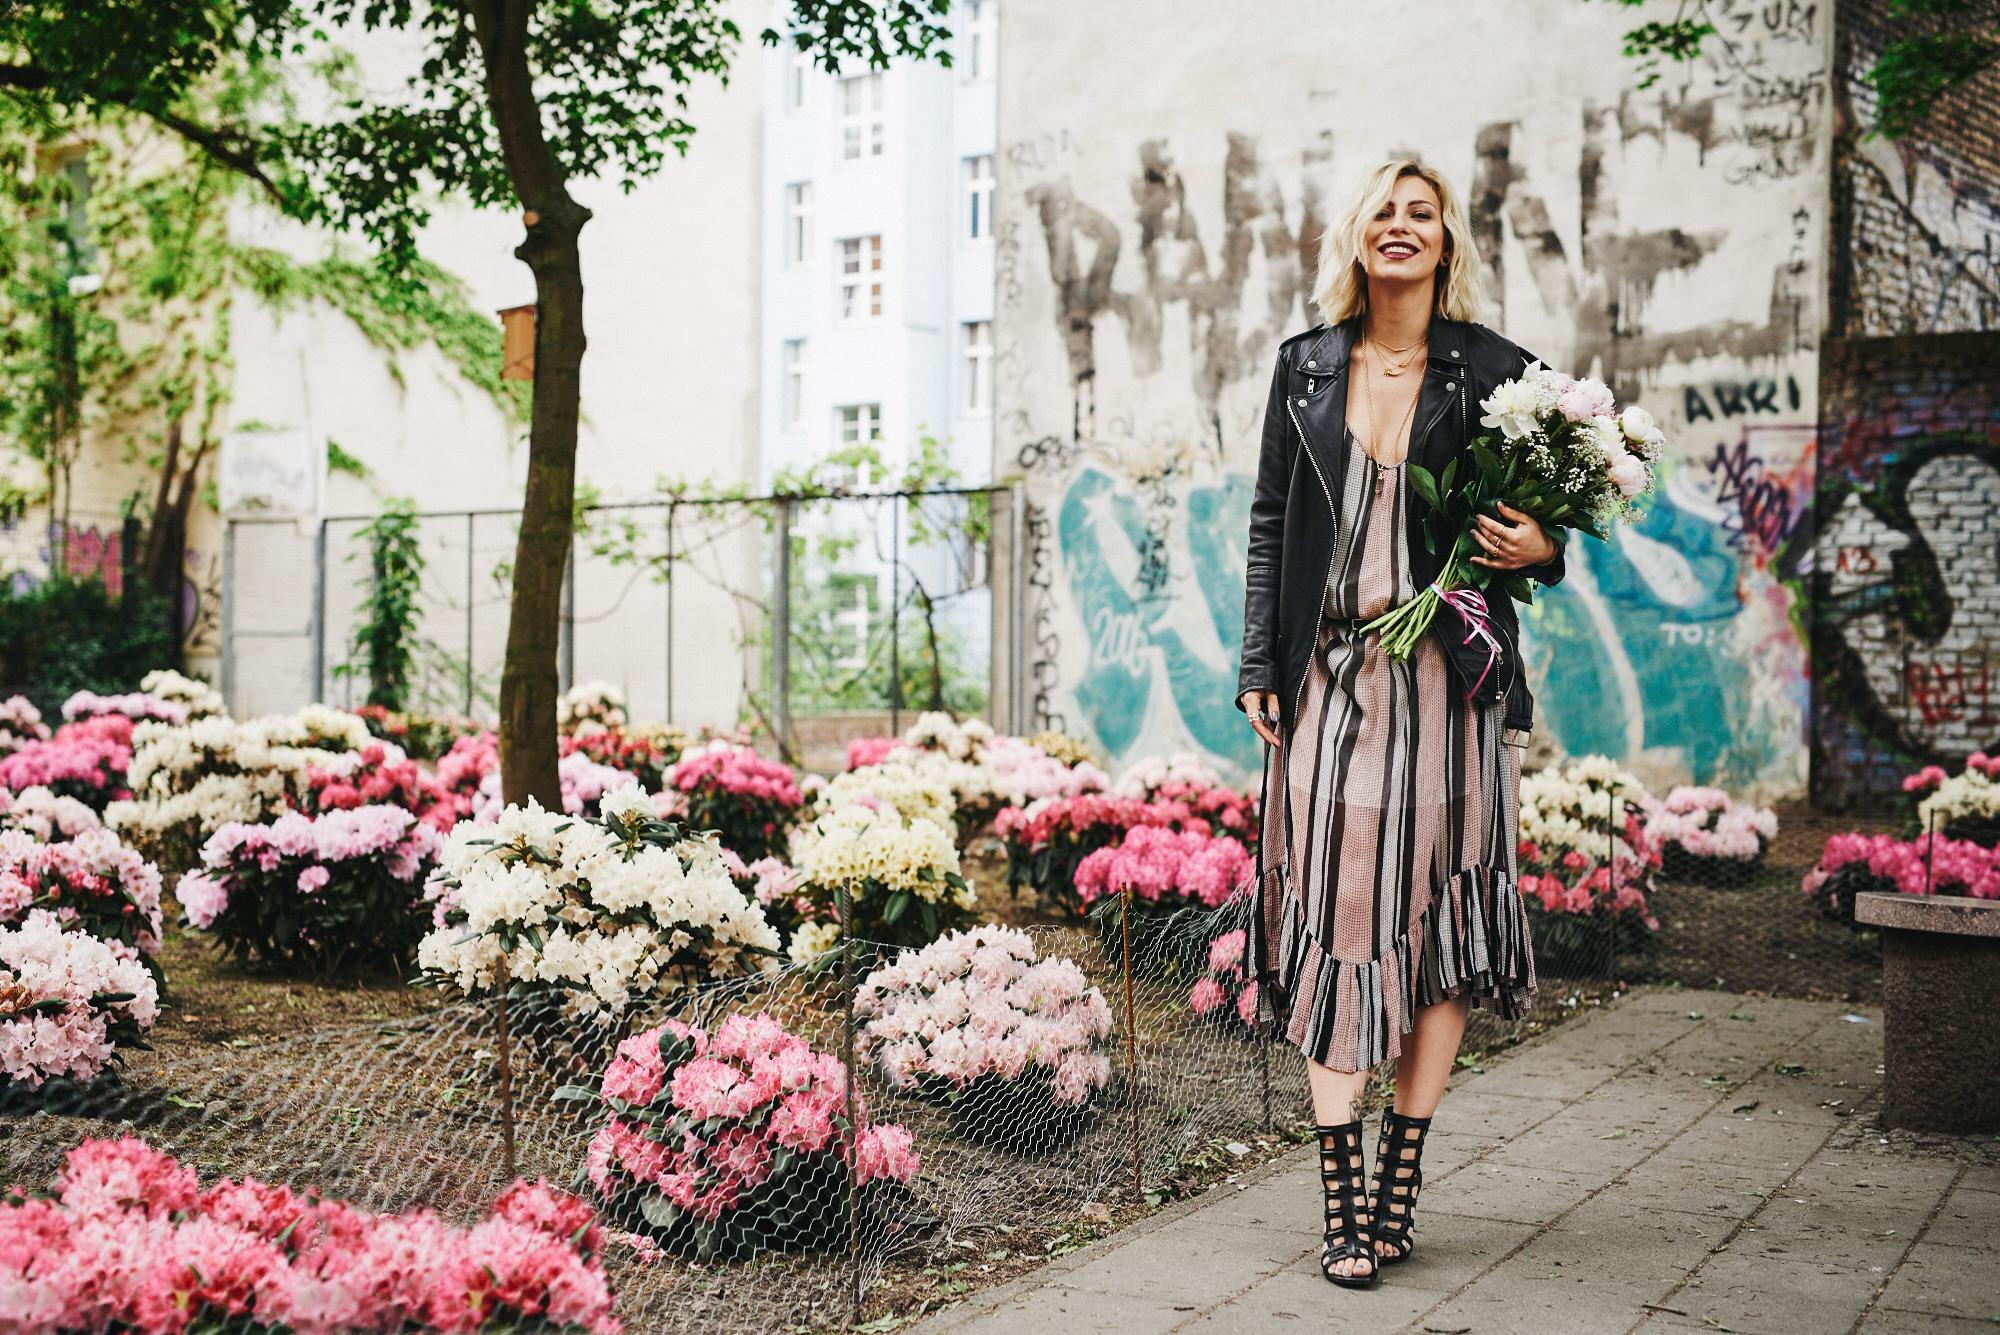 Toll was Blumen machen | Pfingstrose | Peonies | view more pictures and details on my blog | wearing a pink long dress from Baum und Pferdgarten | Weinbergspark | Flower Market Berlin